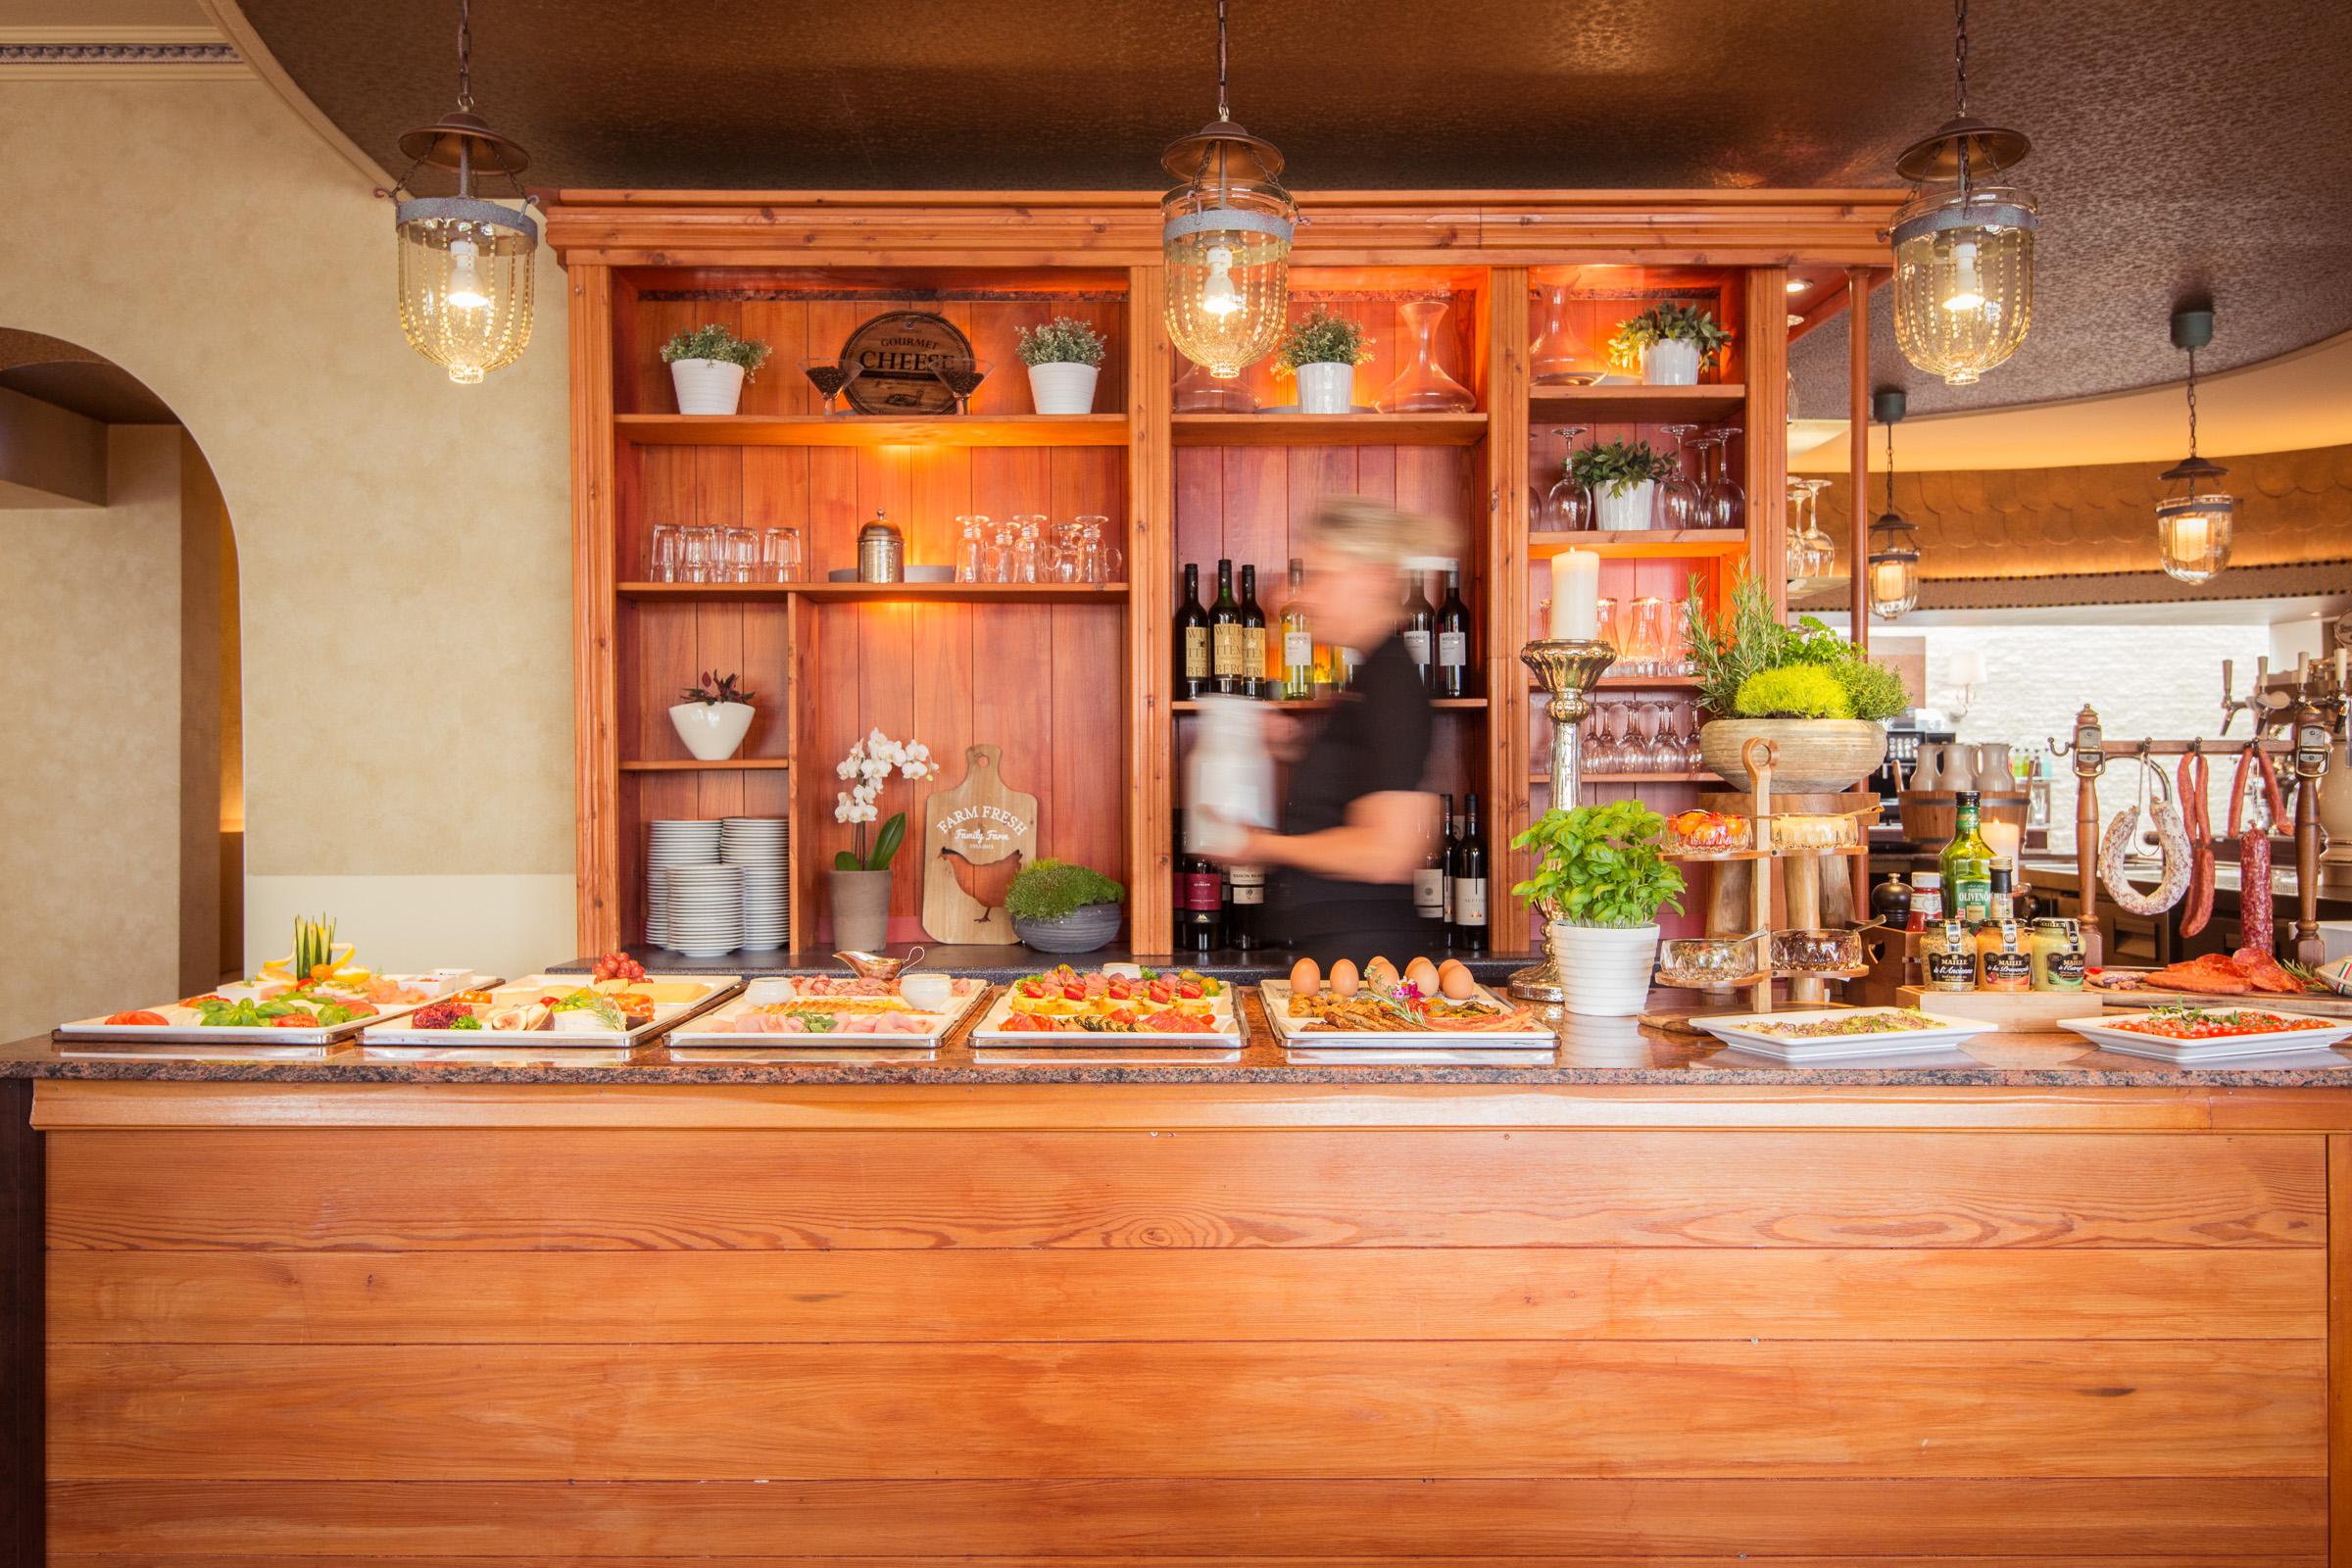 Cafe De Sol Hannover